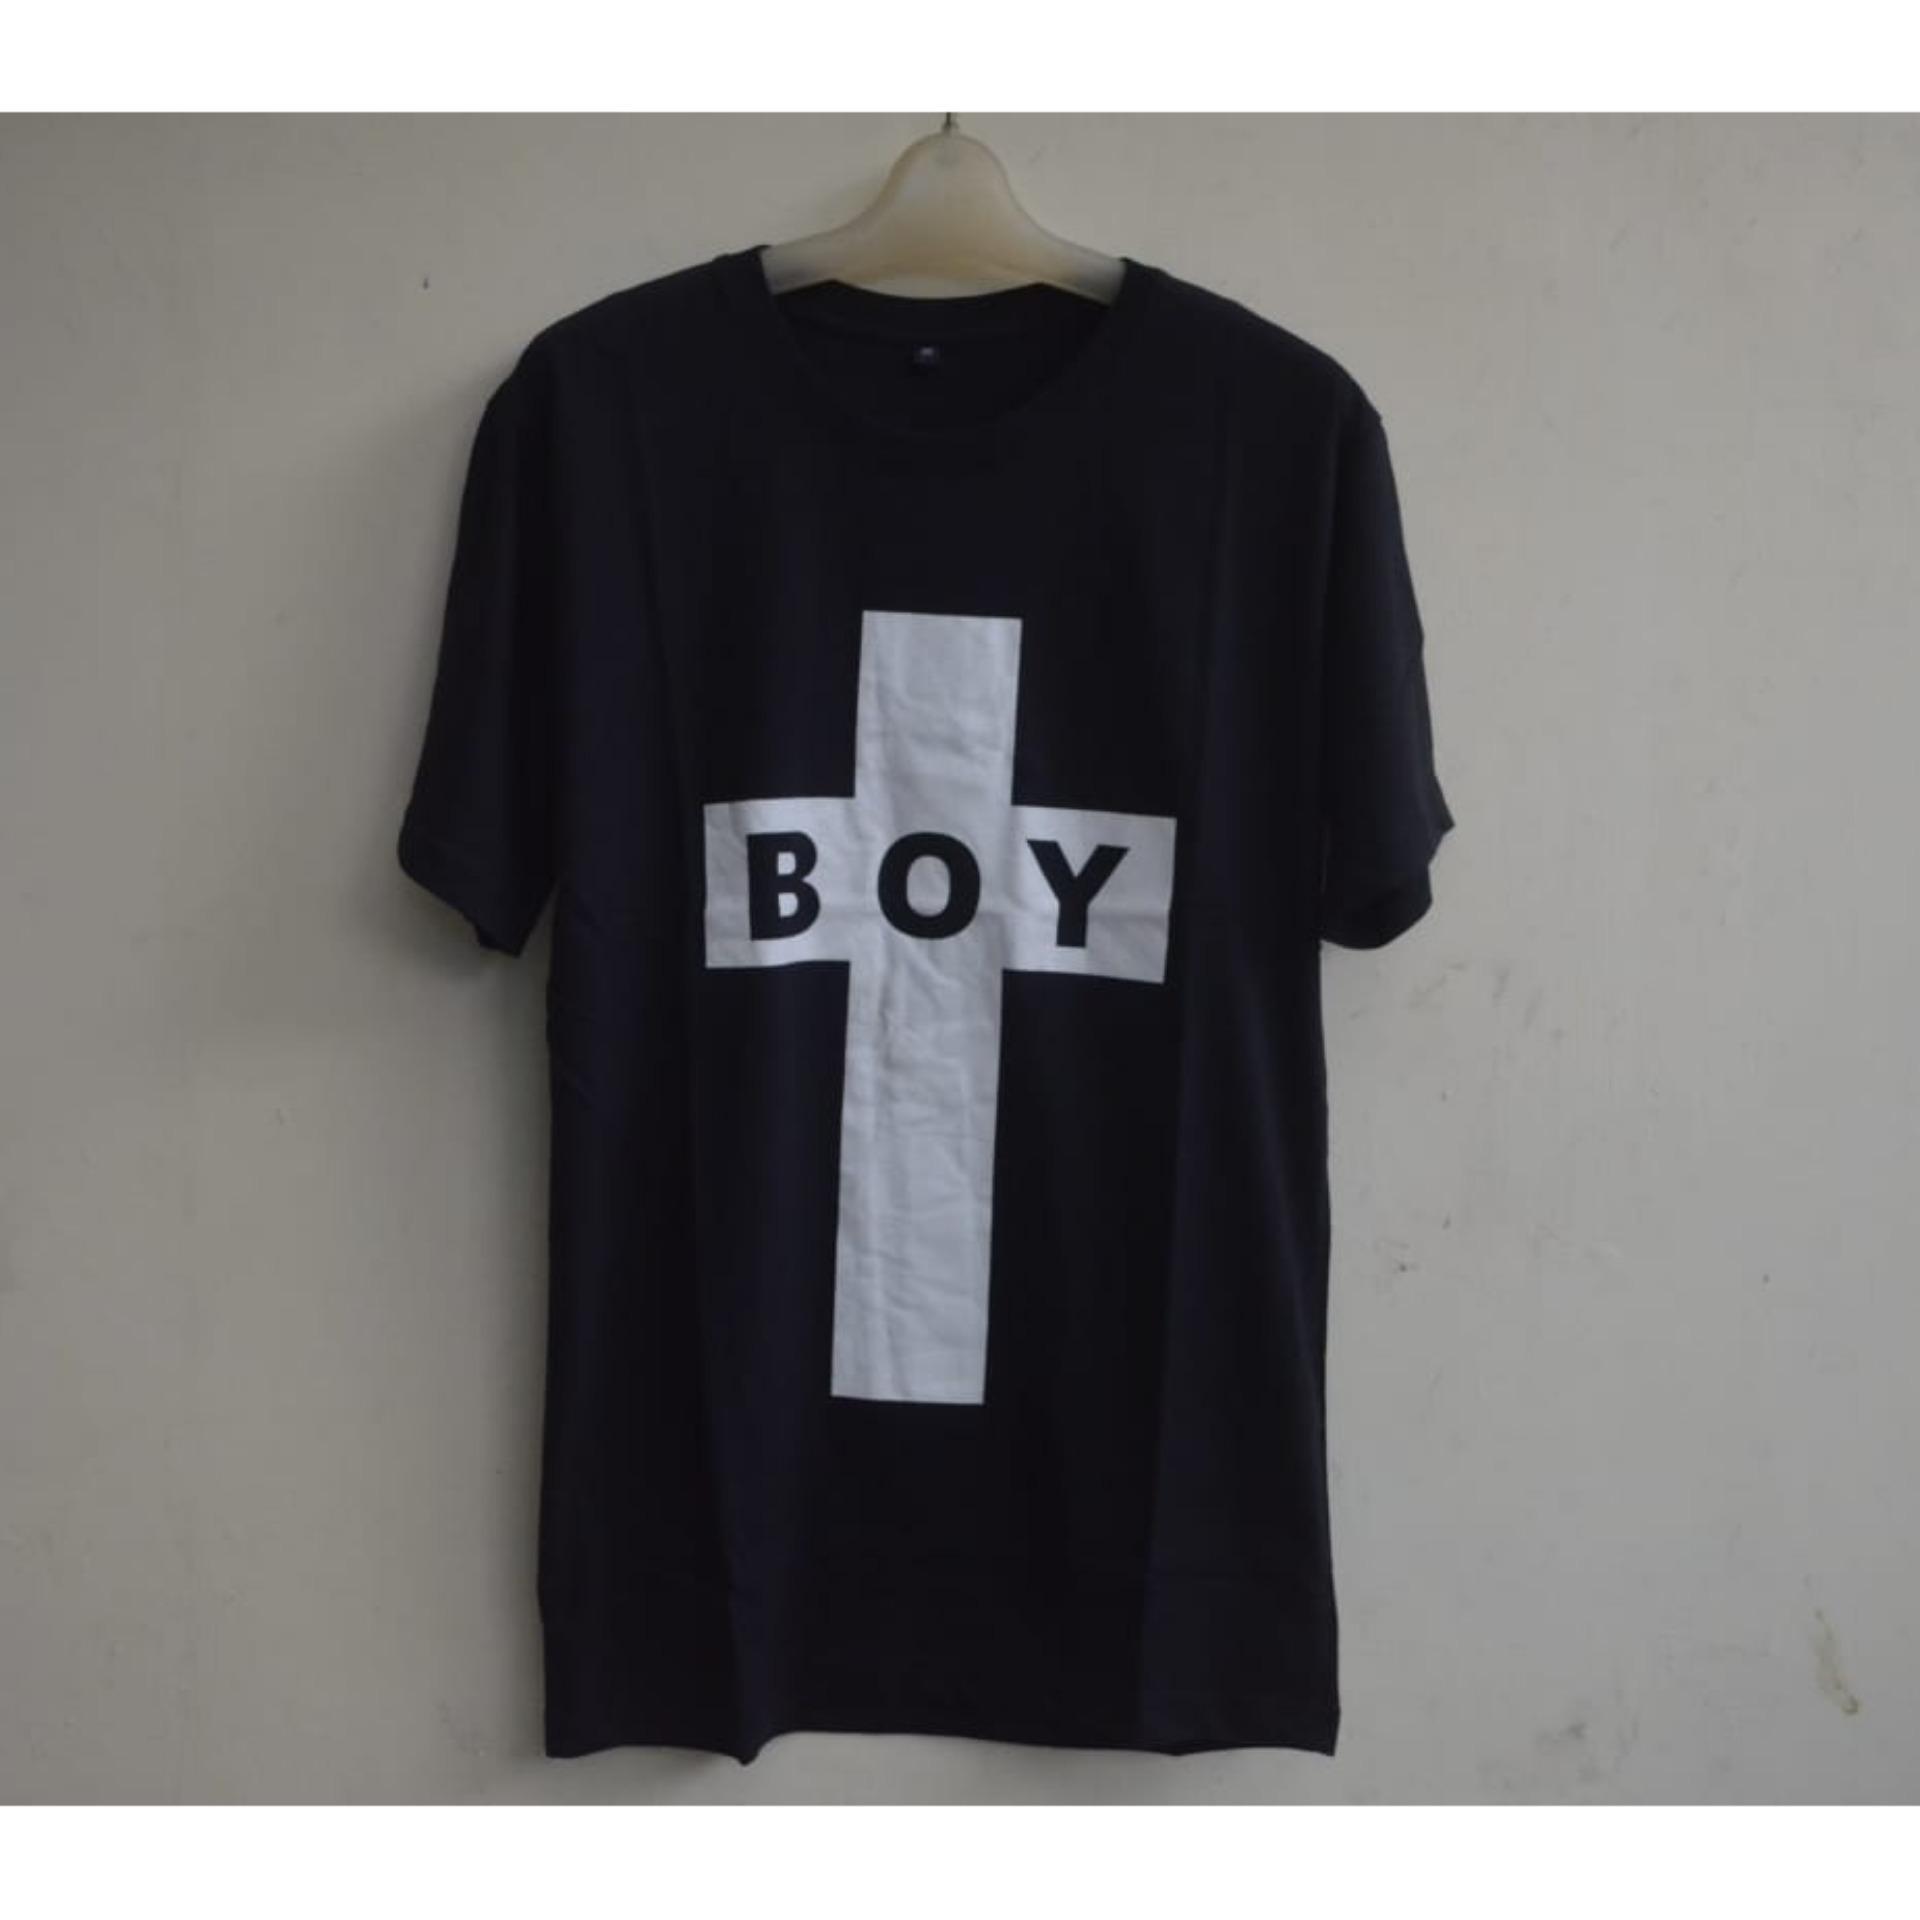 KERAK STORE T-Shirt Distro Pria - kaos Distro Pria - Kaos Terlaris